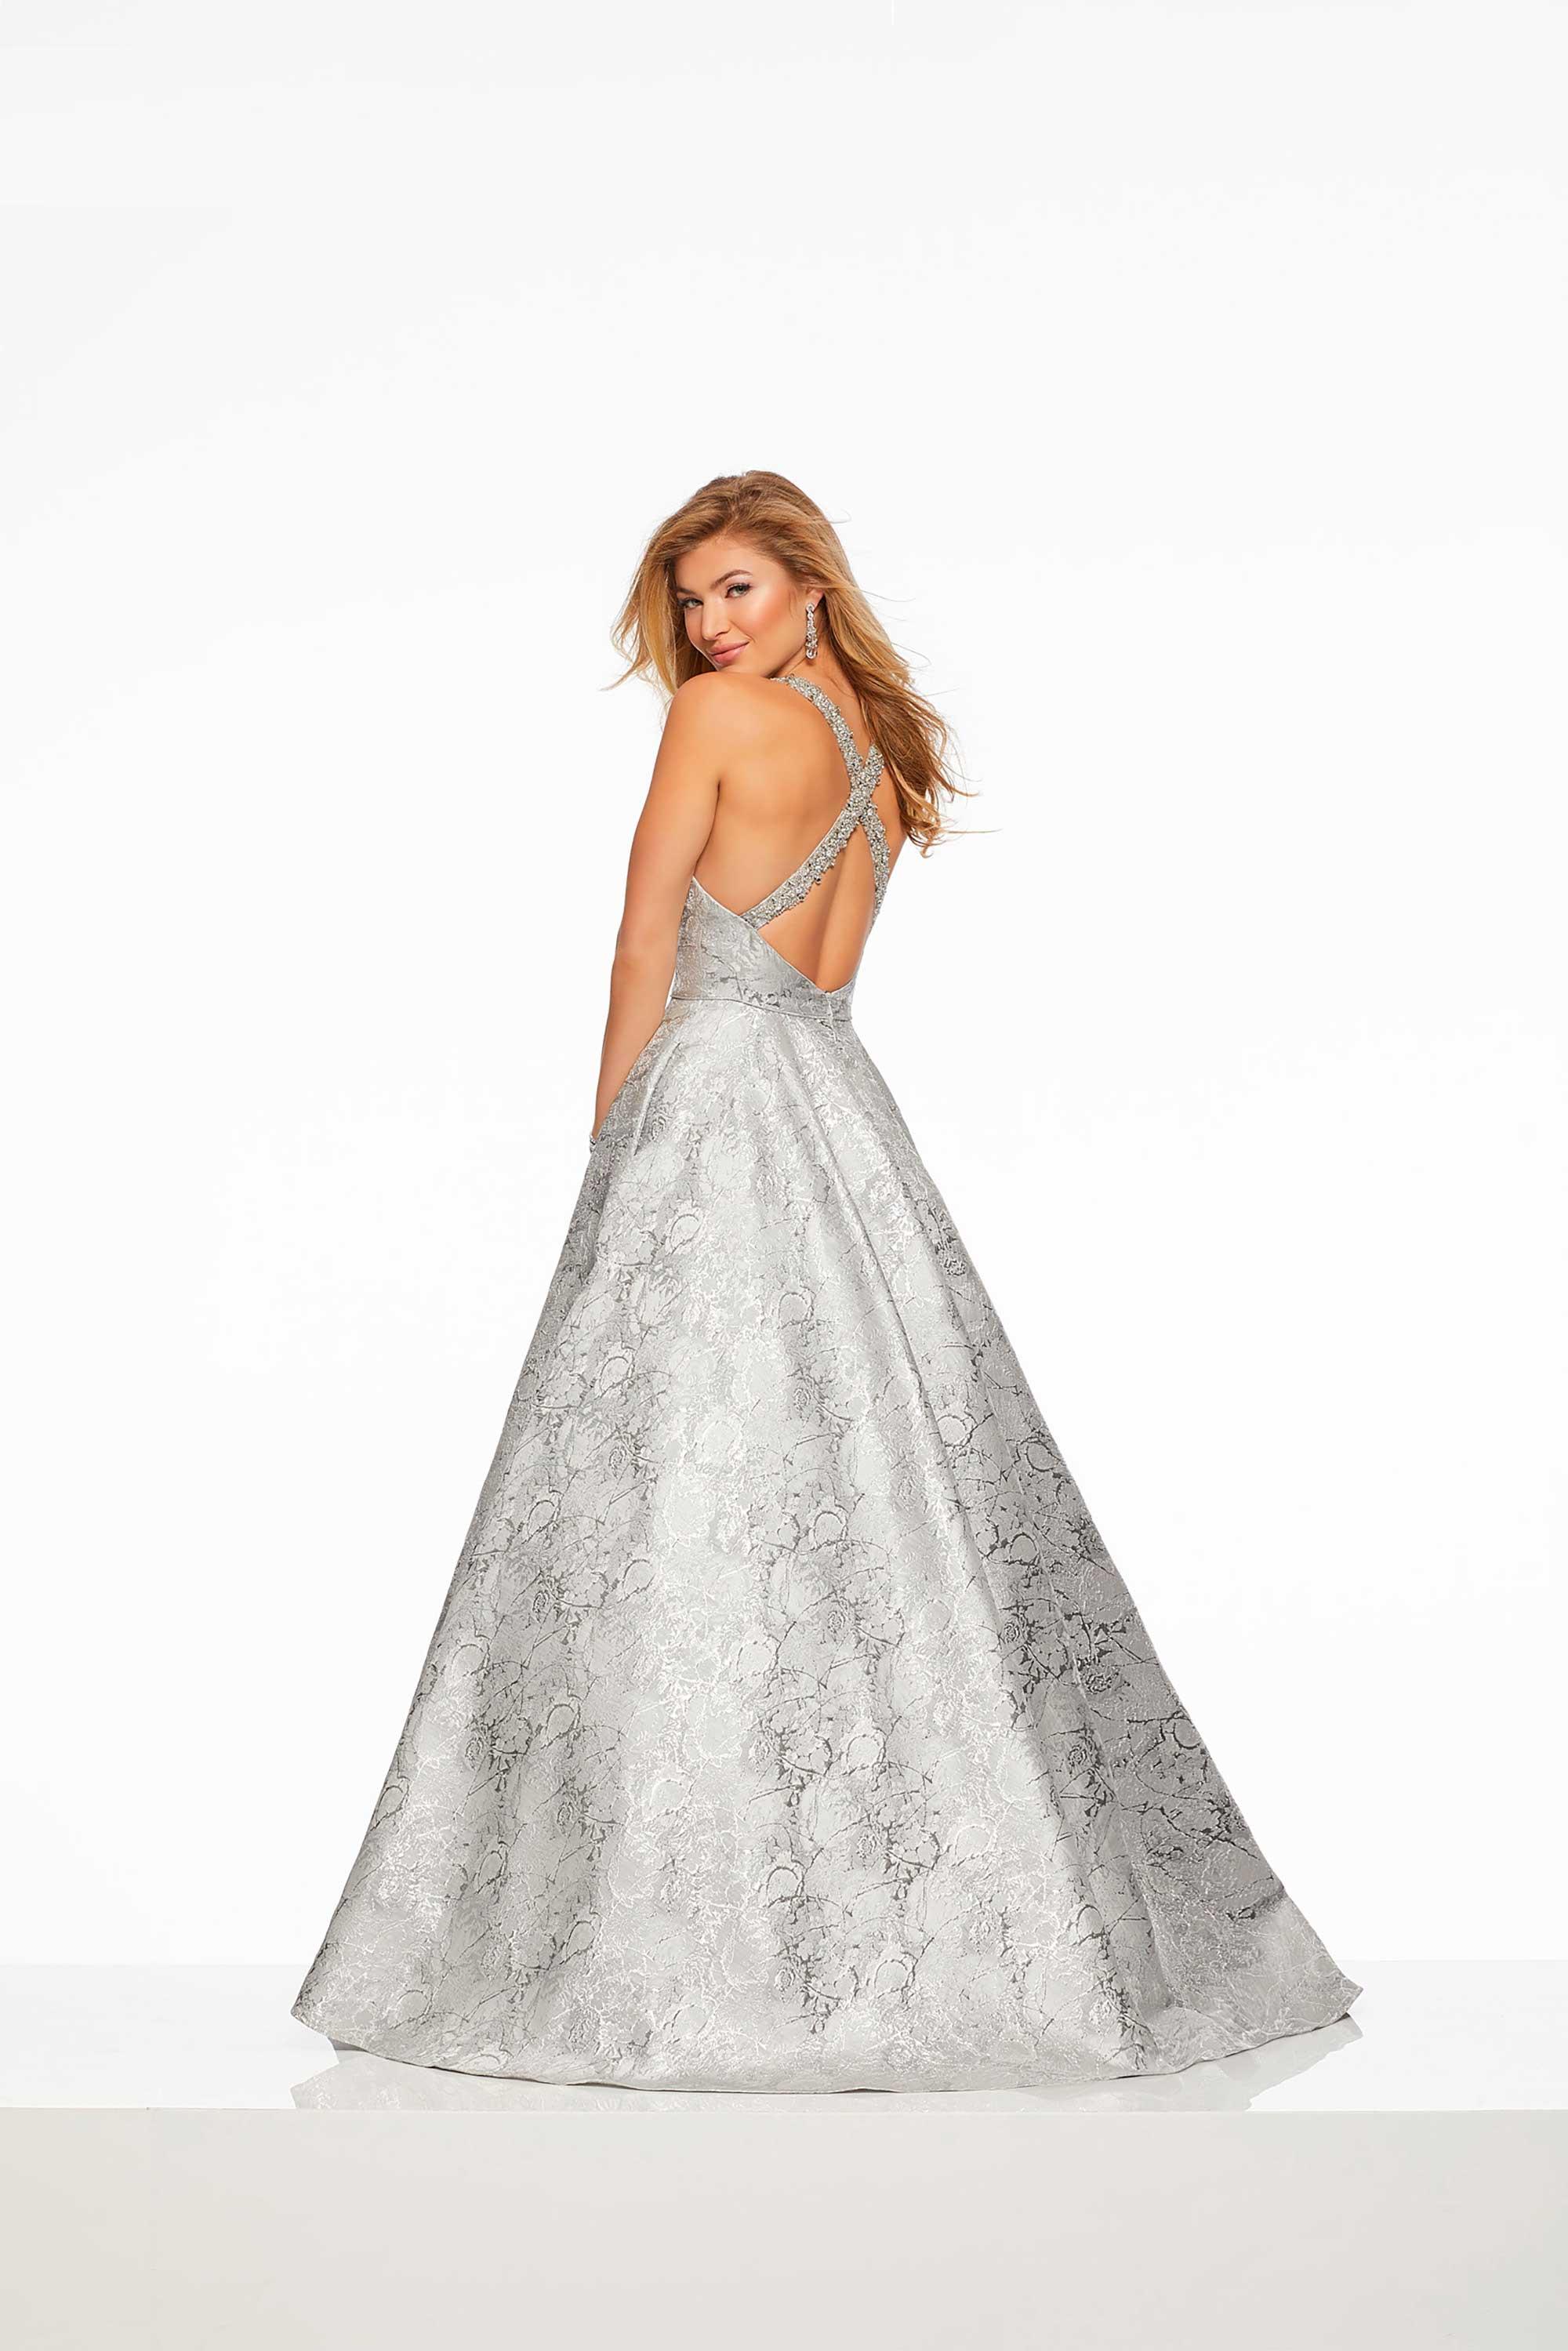 Vestido Lucía Fiesta 2019 mod. 43070 - 5